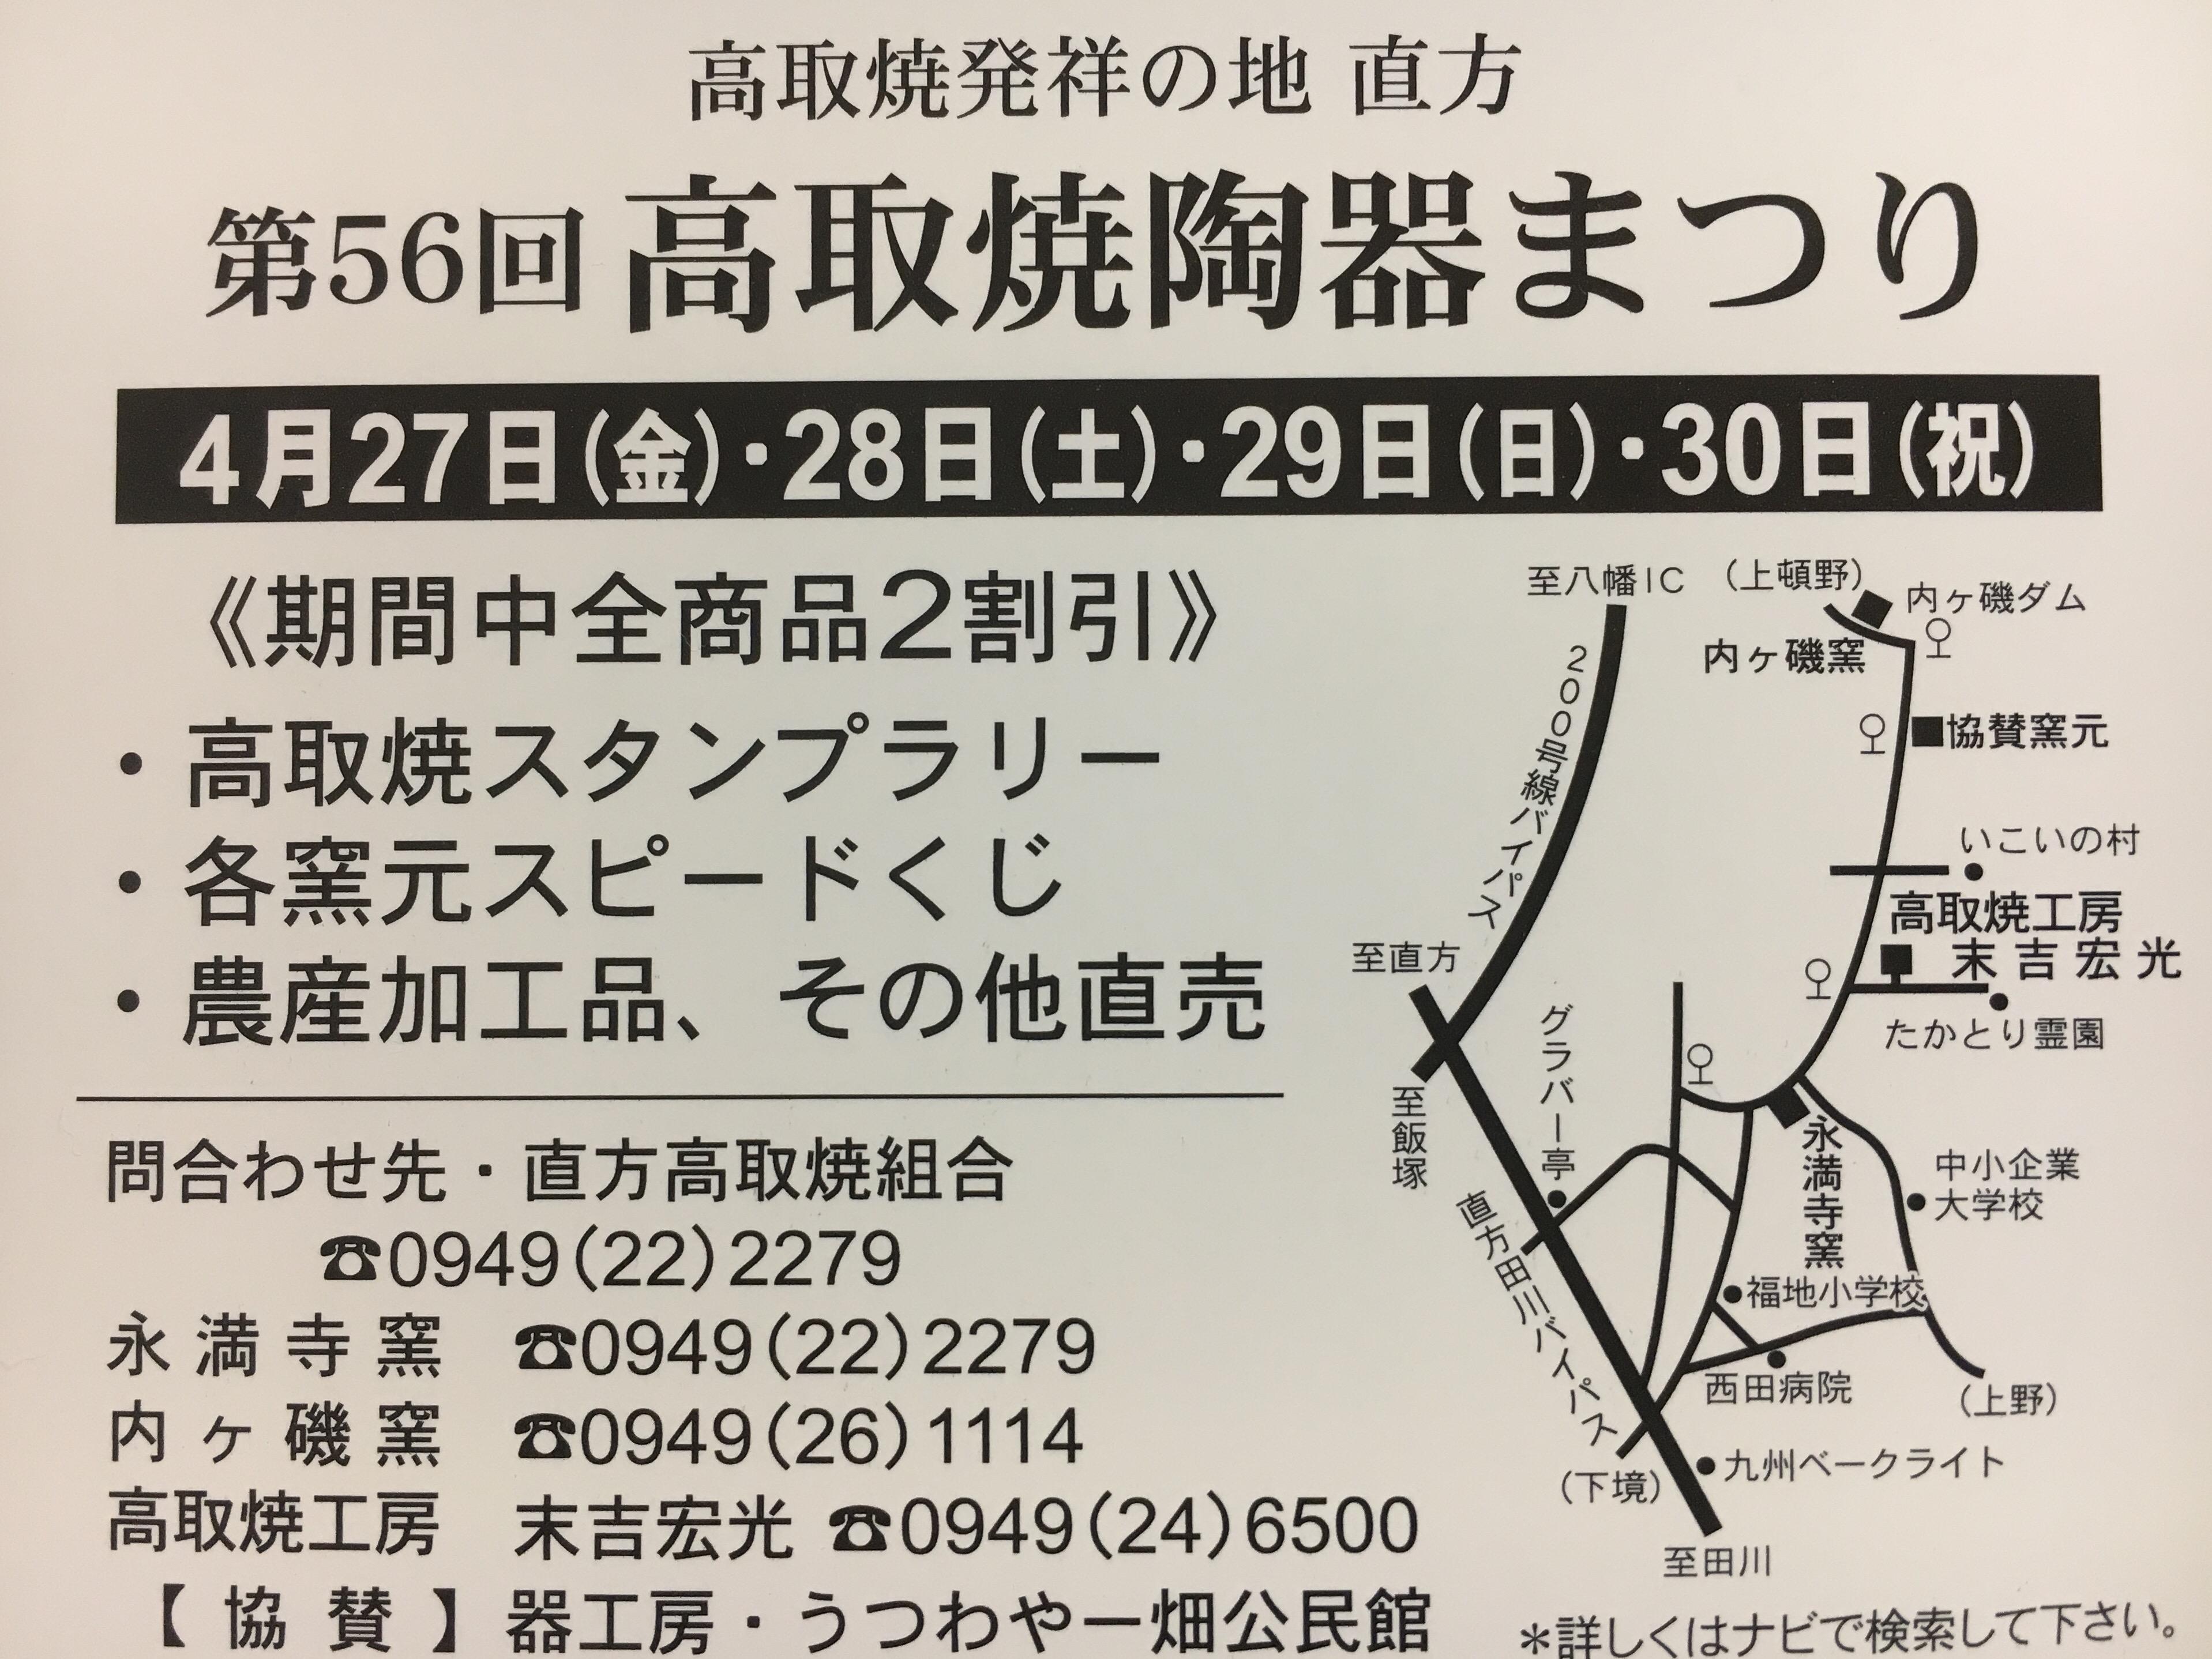 http://www.utuwa-ya.jp/blog/photo/IMG_3794.JPG